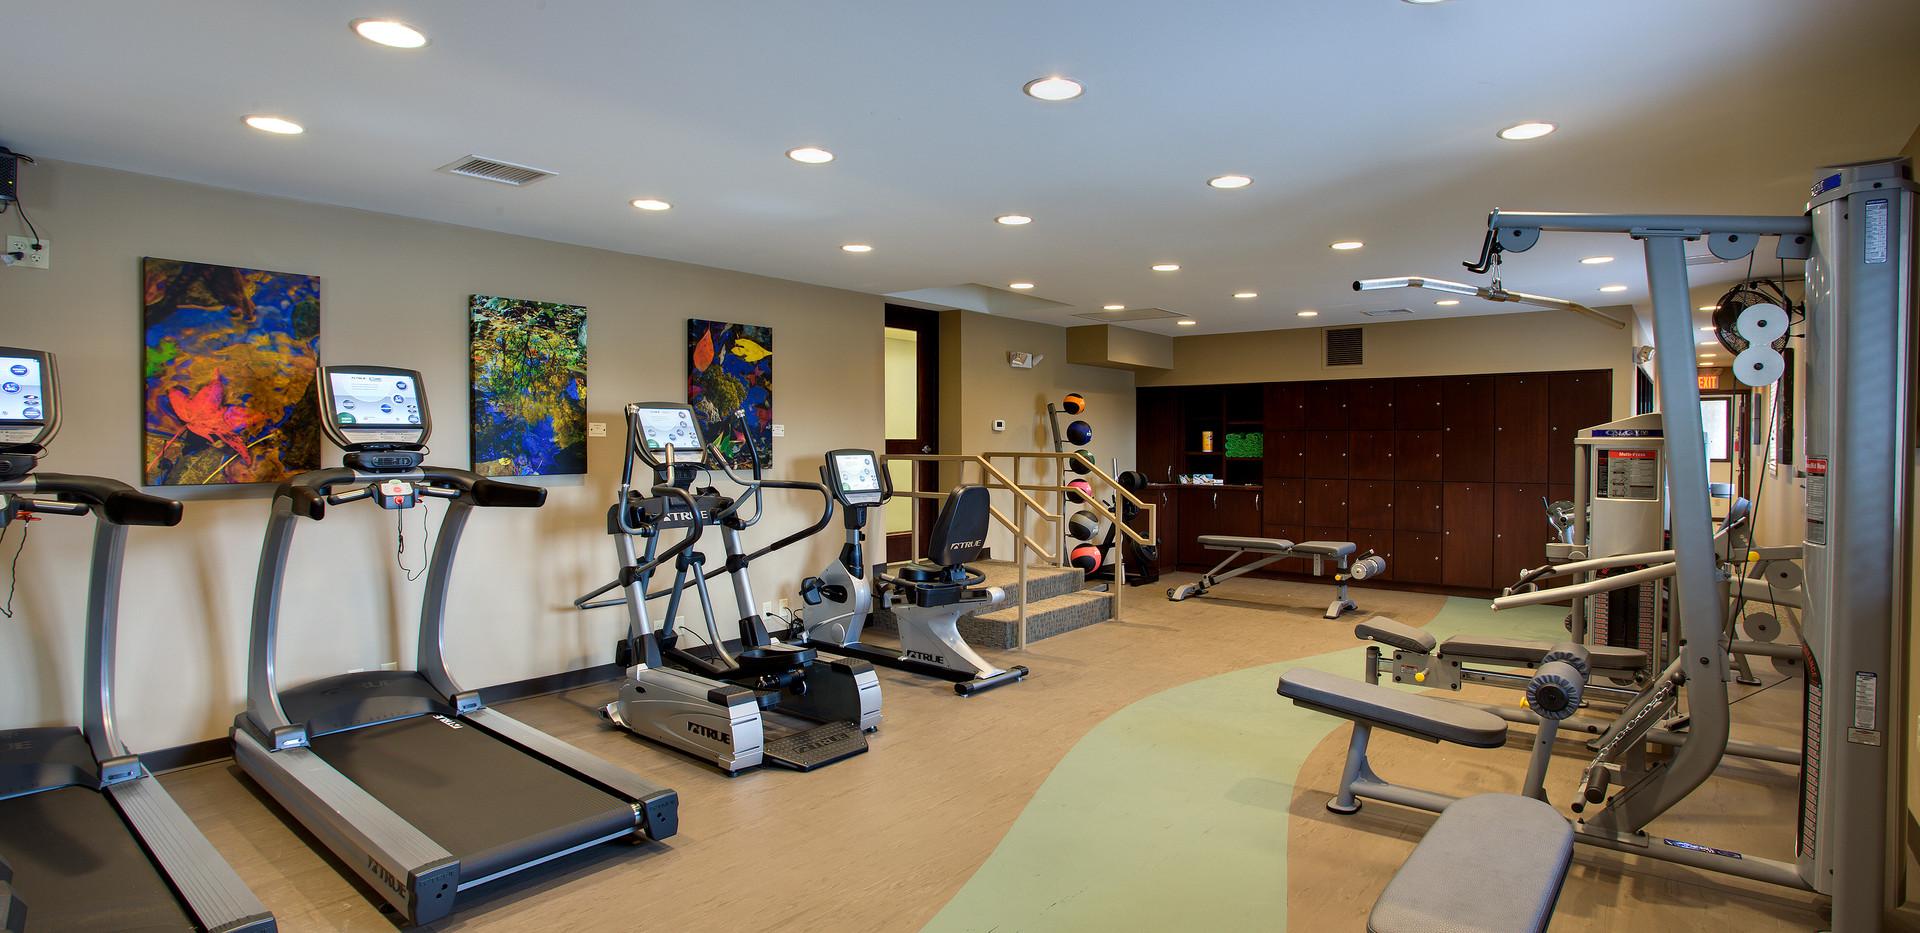 Ollis Exercise Room.jpg